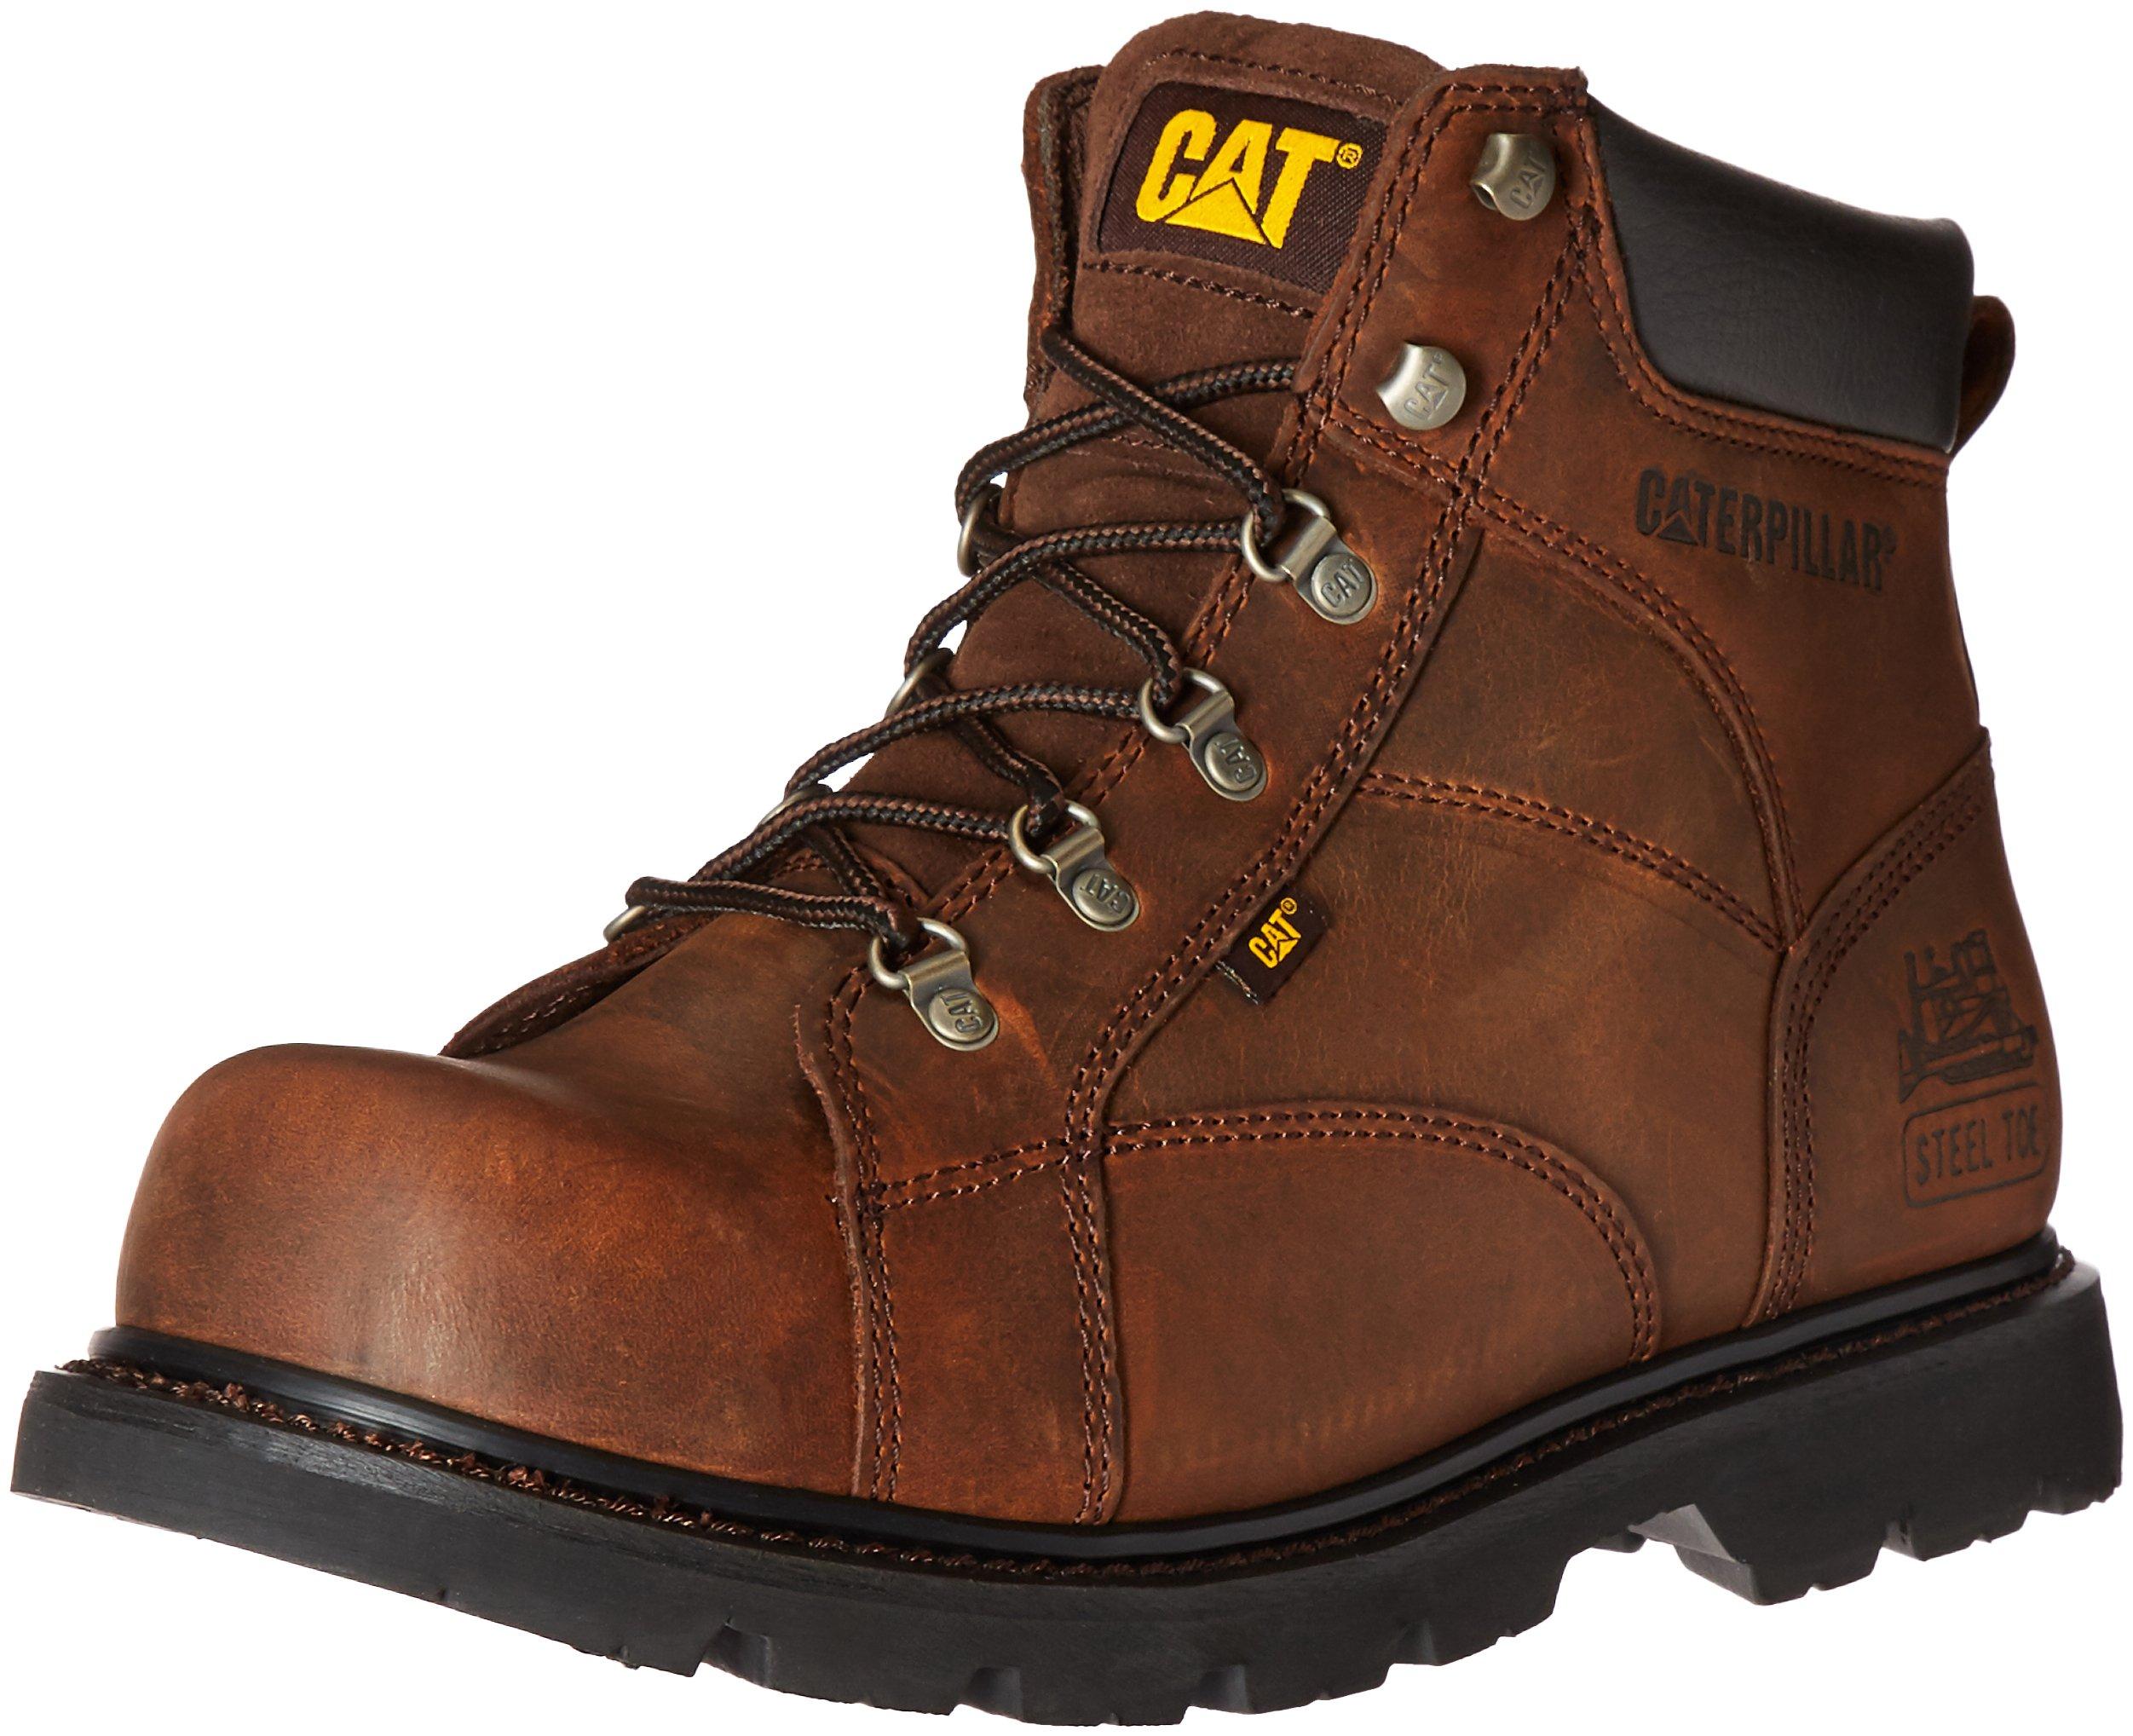 Caterpillar Men's Mortar Work Boot,Dark Brown,11.5